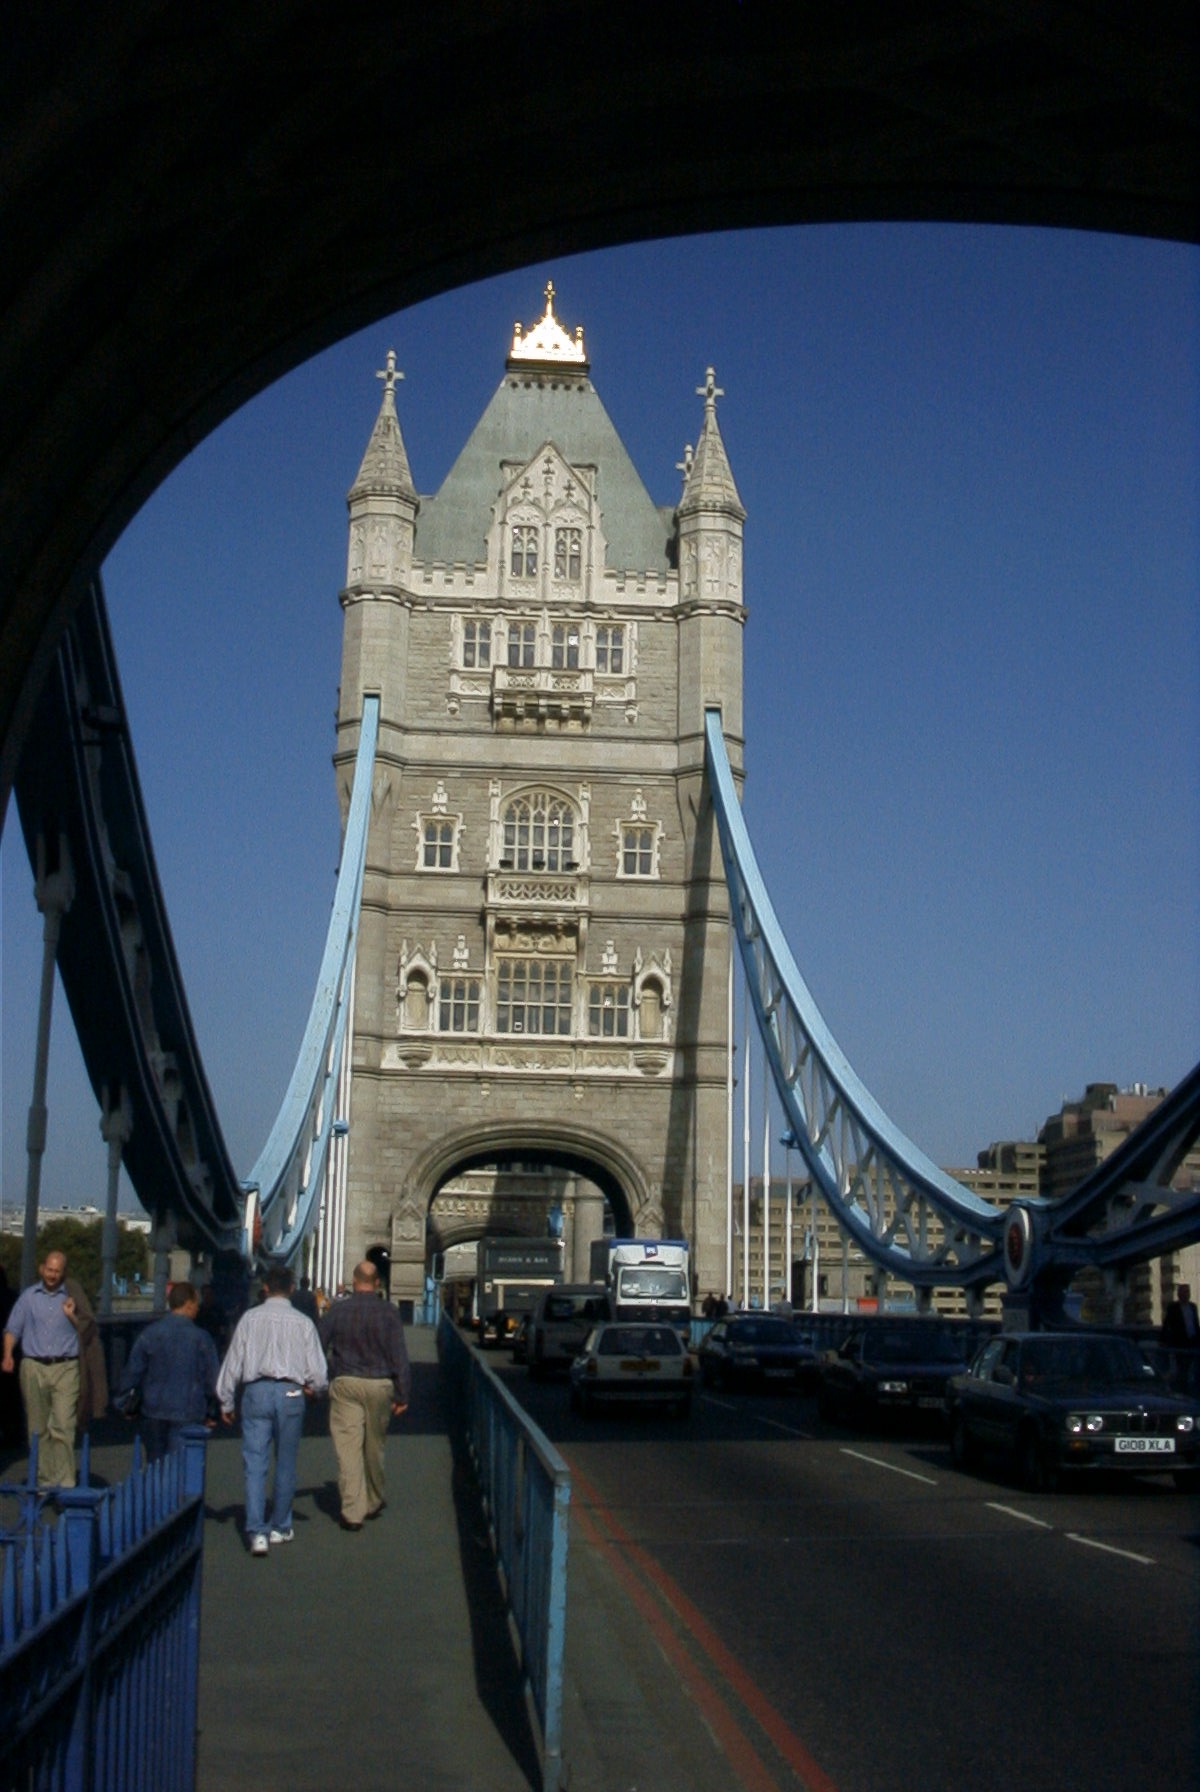 Tower Bridge - Fairfield Control Systems